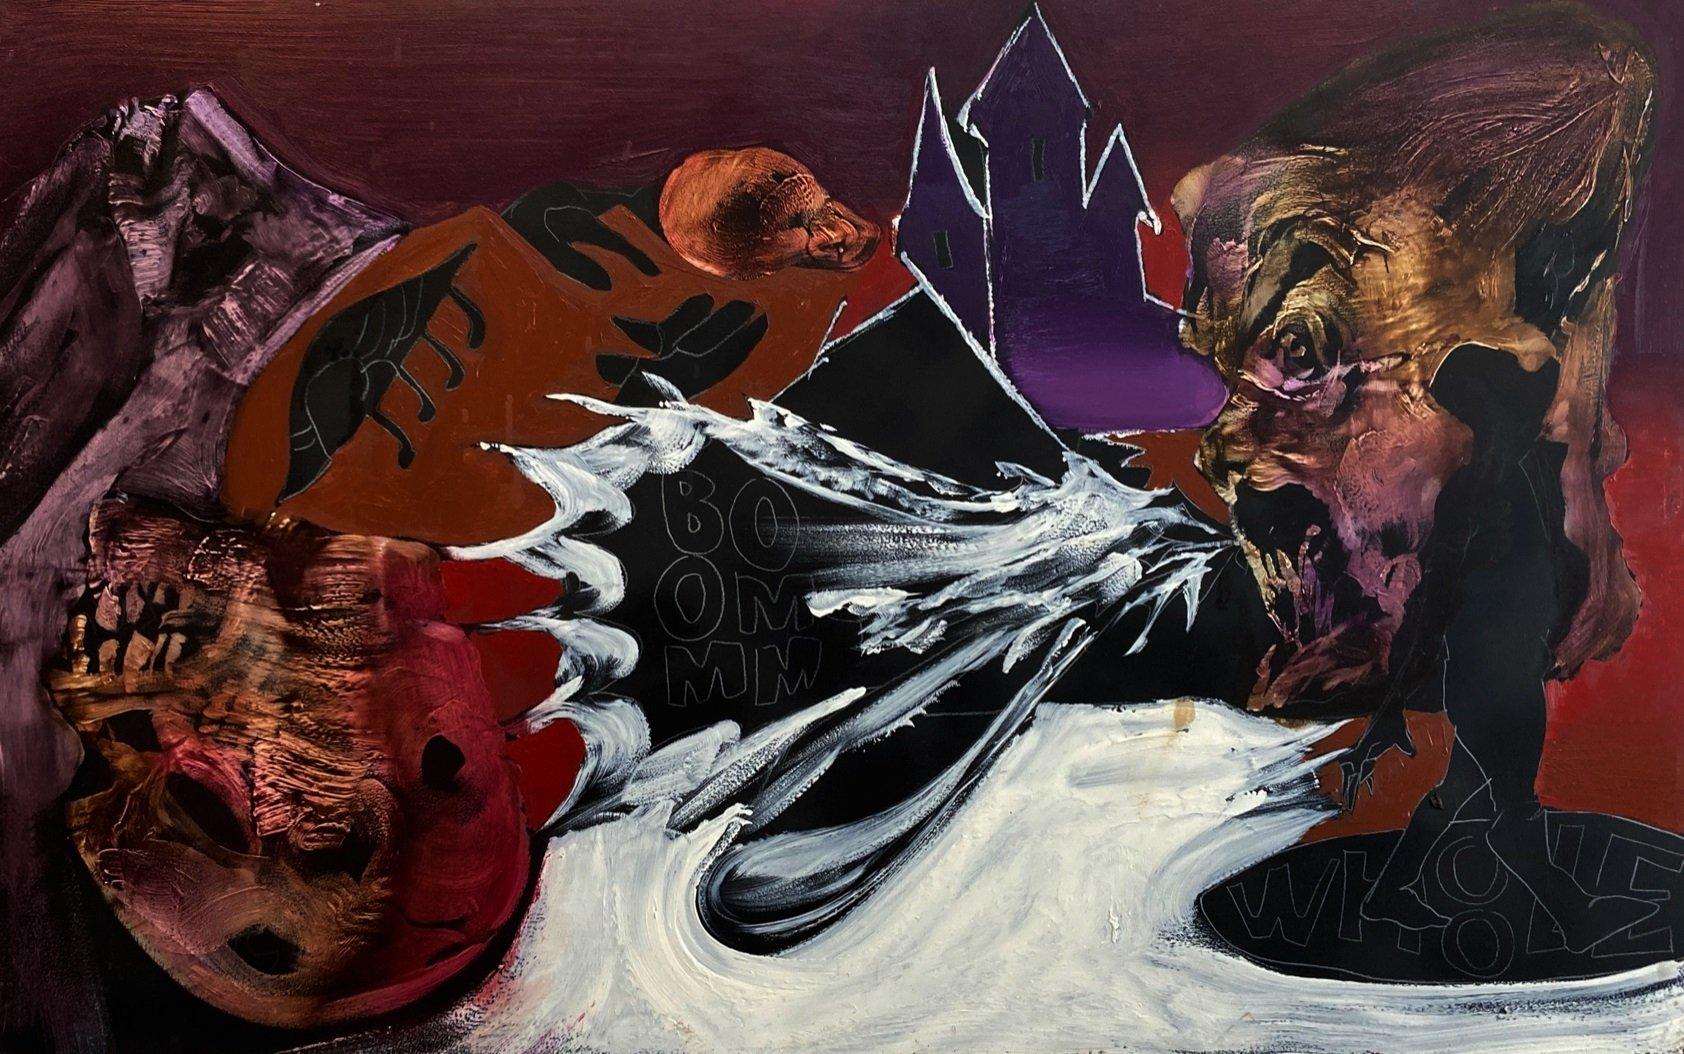 Mustafa Horosan, untitled, 2020, oil on board, 59 by 98.5 centimeters. (Courtesy of Daniel Raphael Gallery)